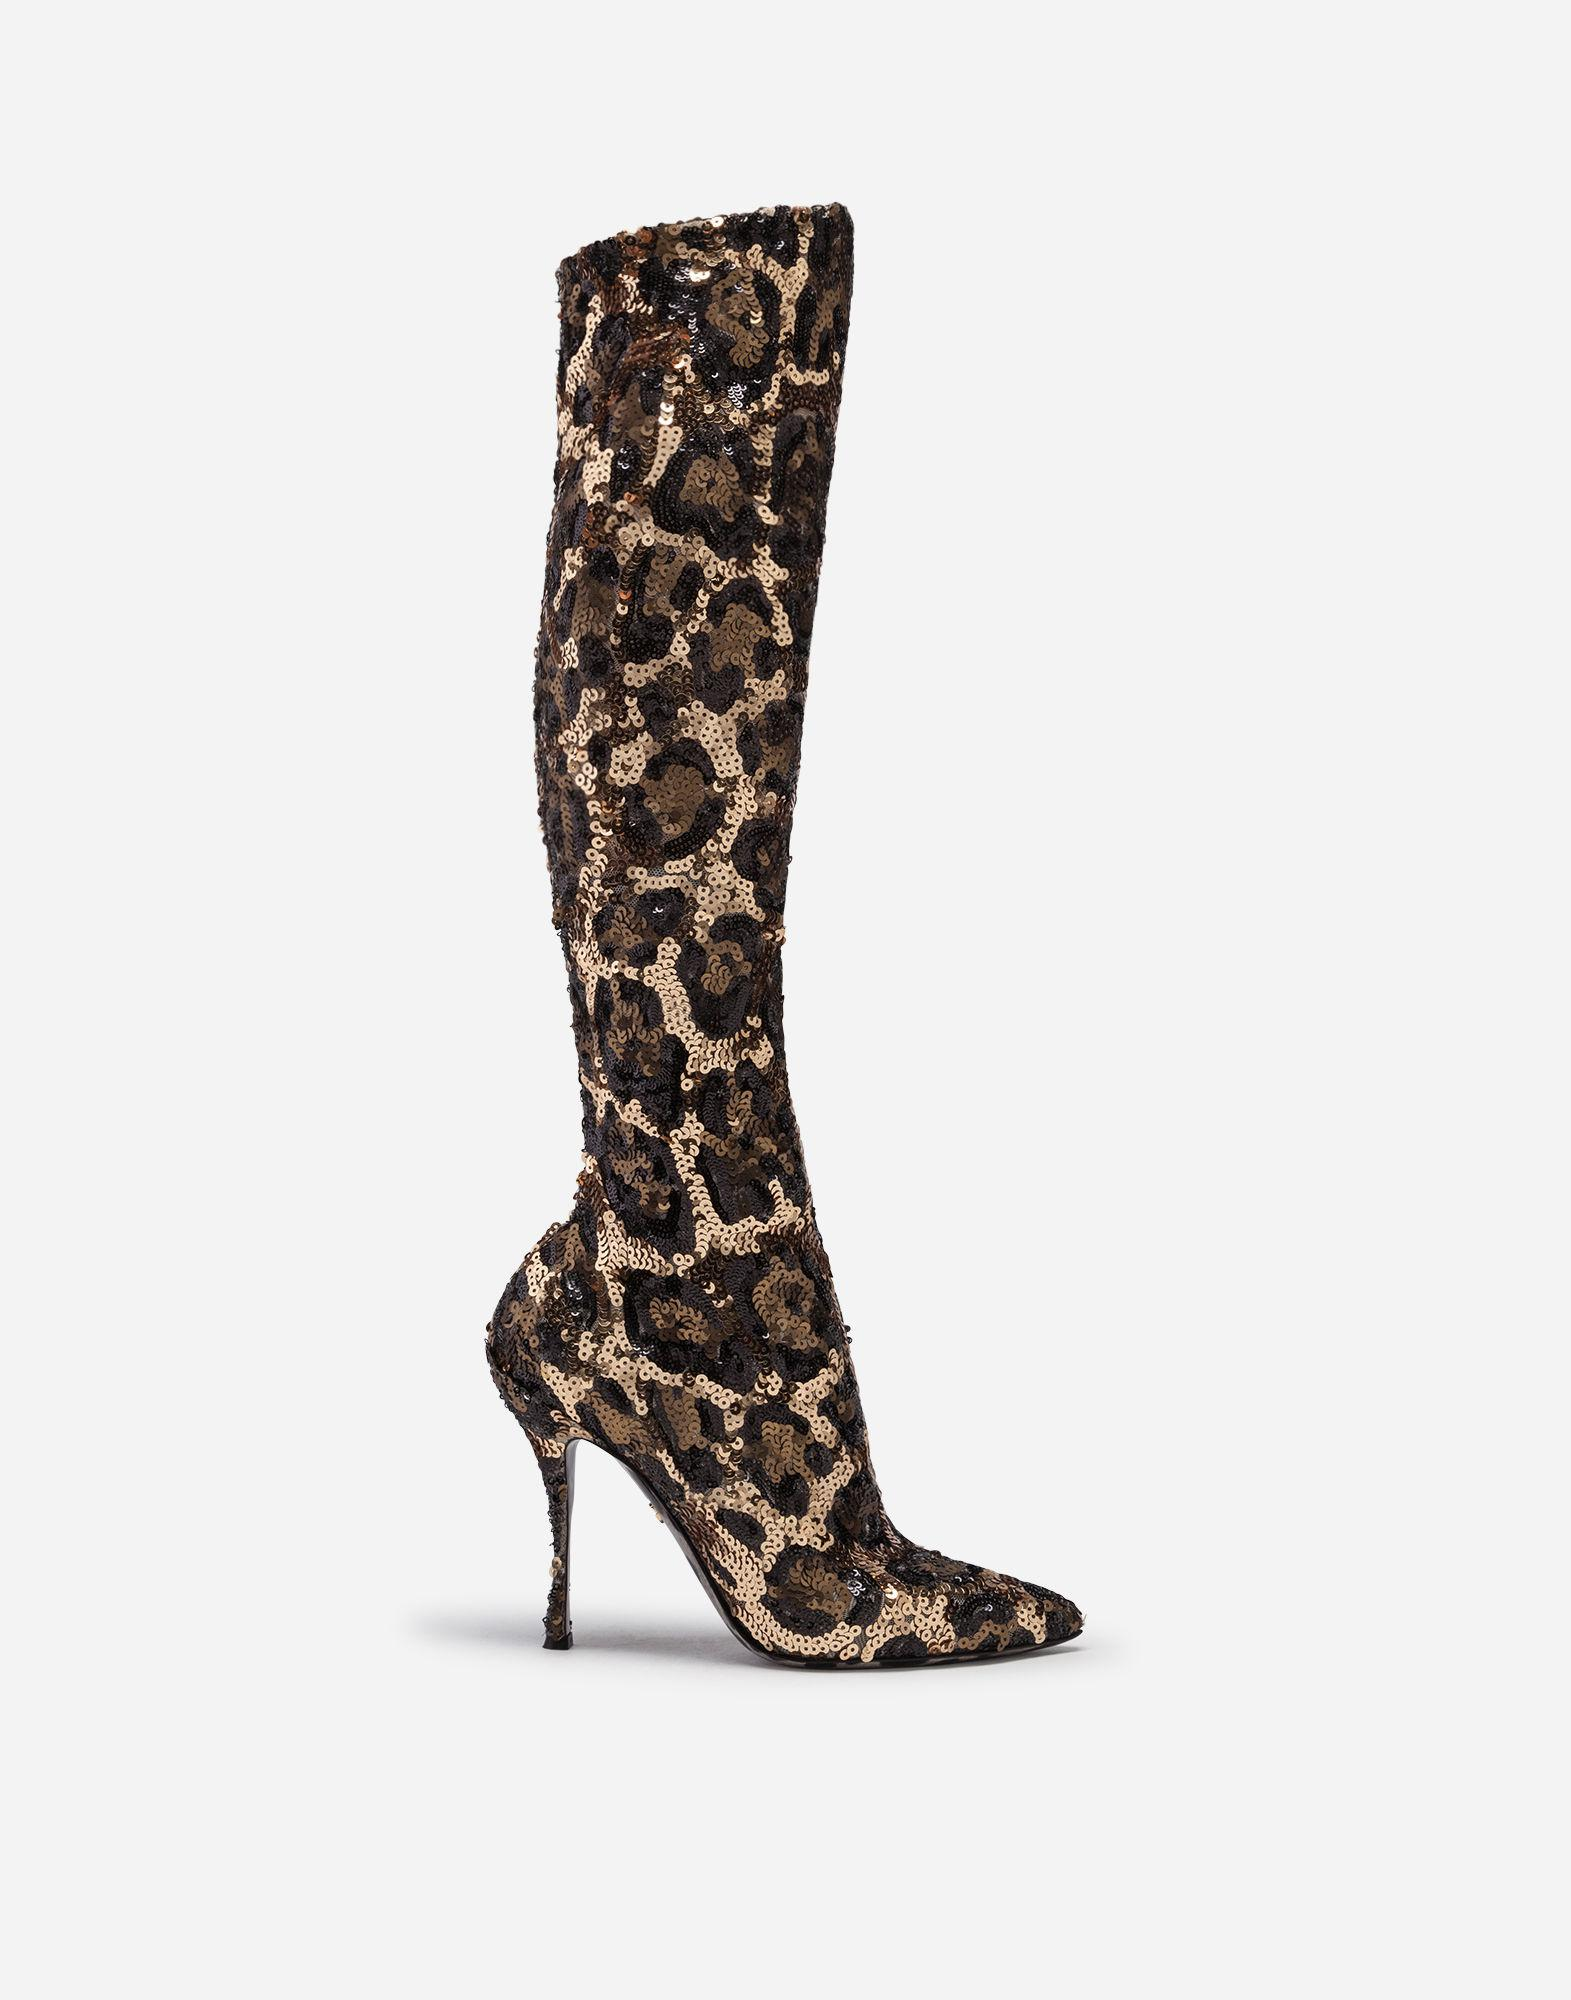 831d6649f10c Dolce   Gabbana. Women s Sequined Boots